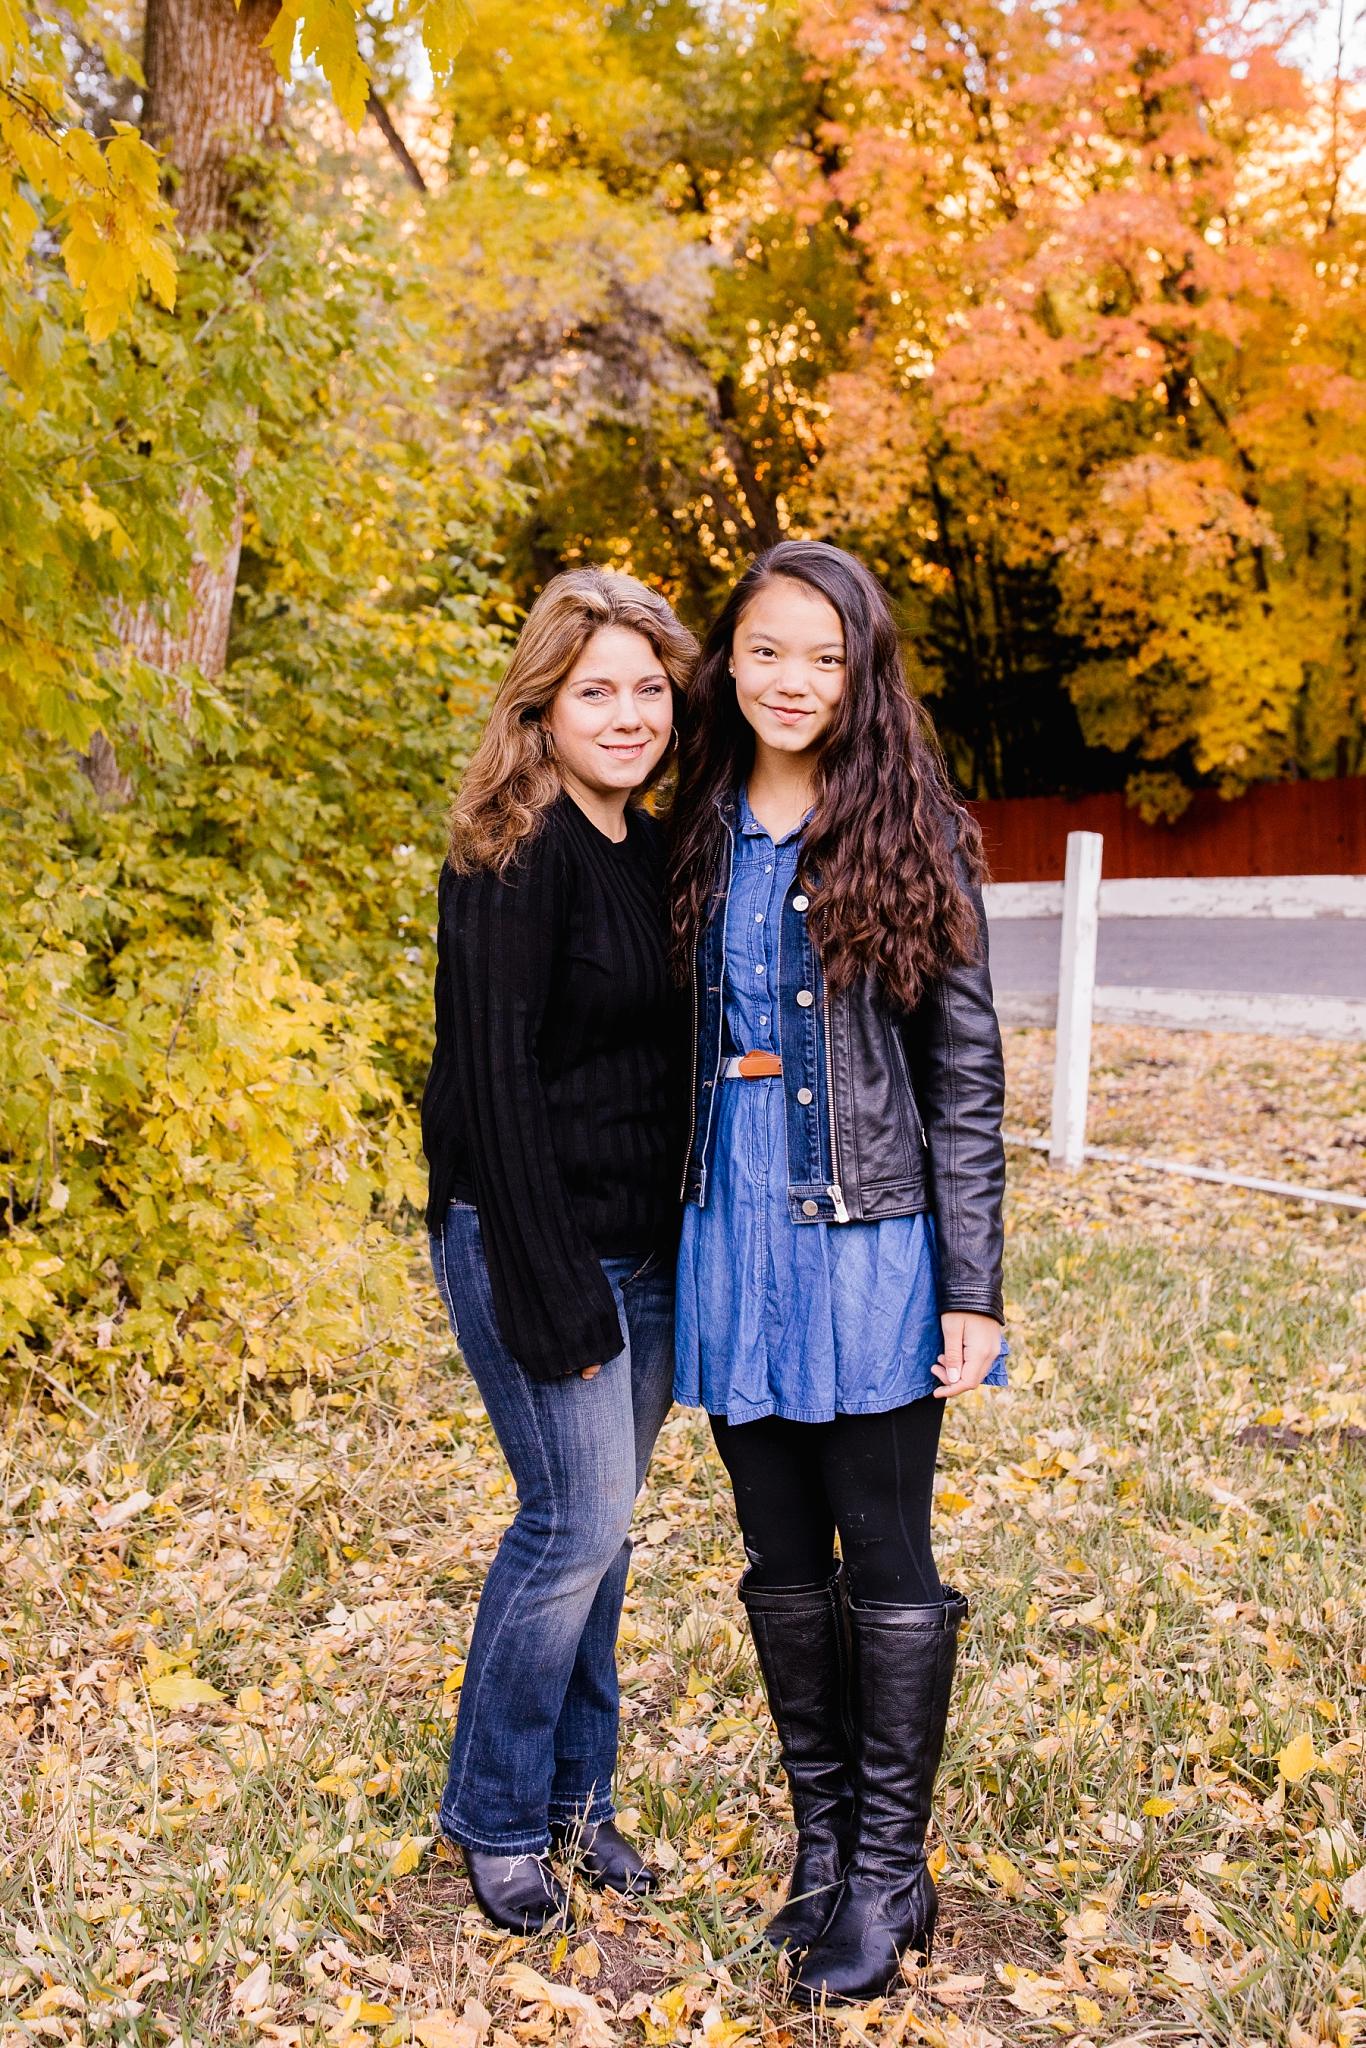 Qian-98_Lizzie-B-Imagery-Utah-Family-Photographer-Lifestyle-Photography-Salt-Lake-City-Park-City-Utah-County-Jolleys-Ranch-Hobble-Creek-Canyon-Springville-Utah.jpg